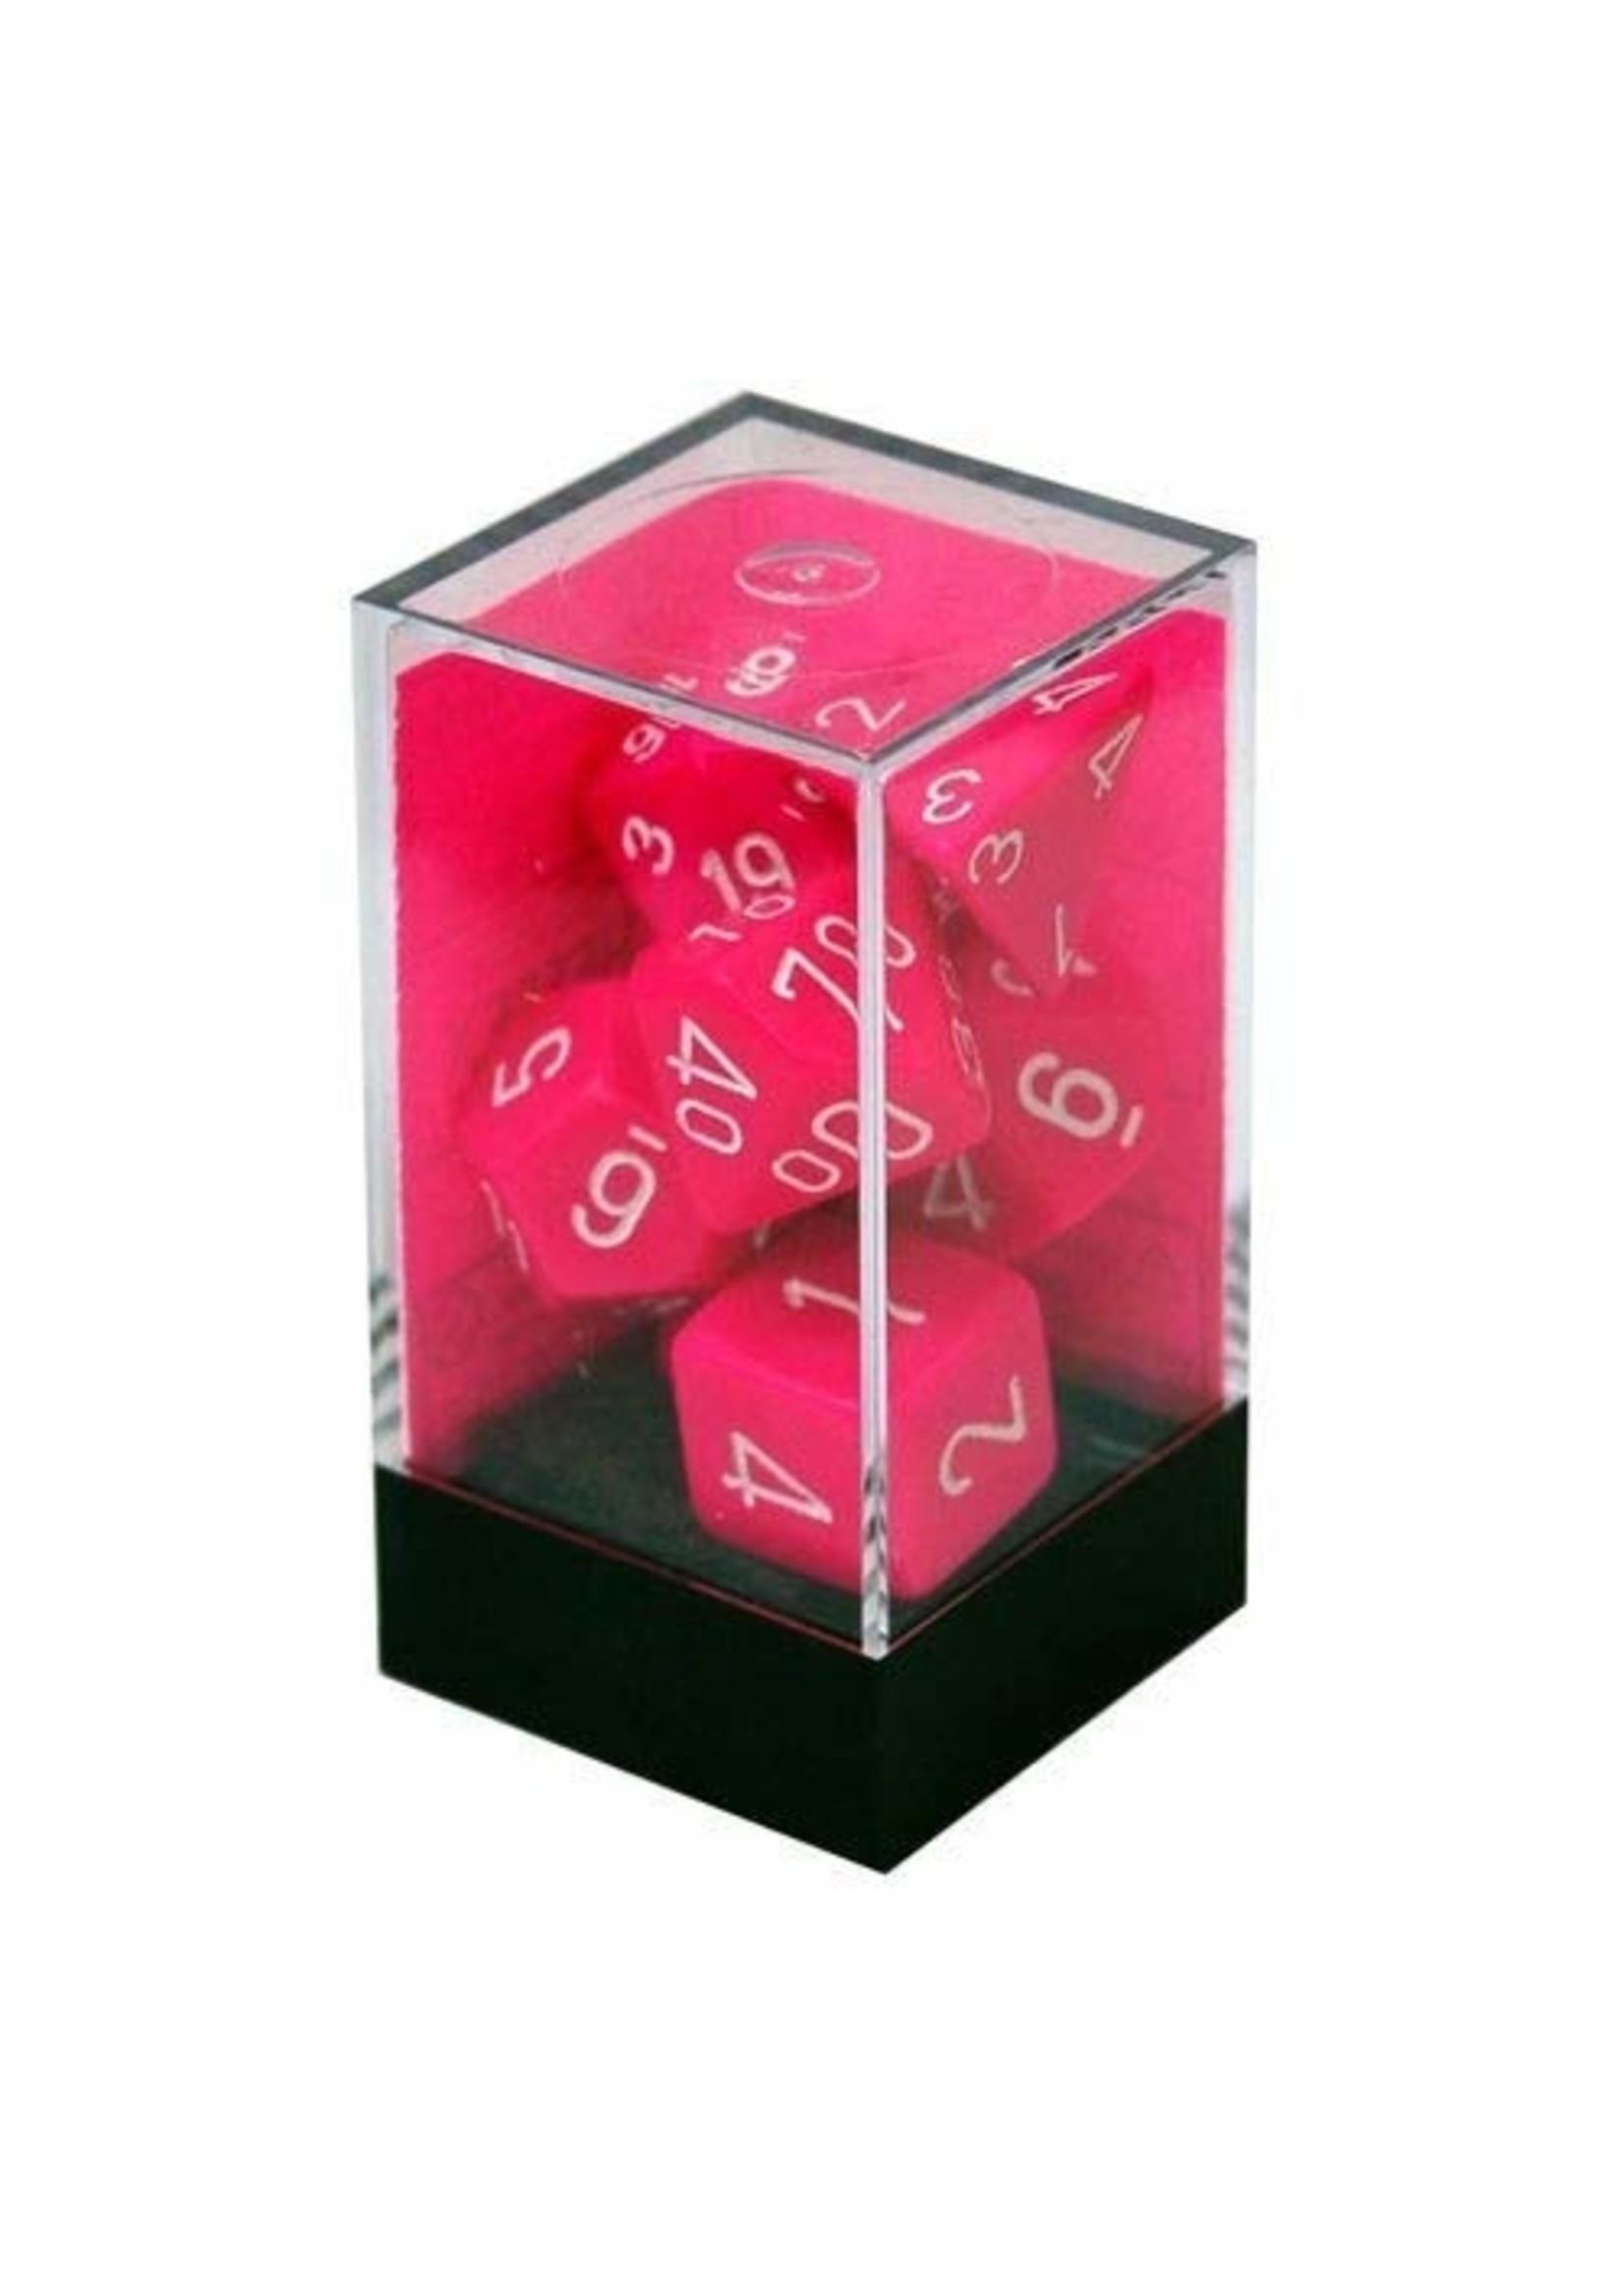 CHX 25444 Dice Pink/white